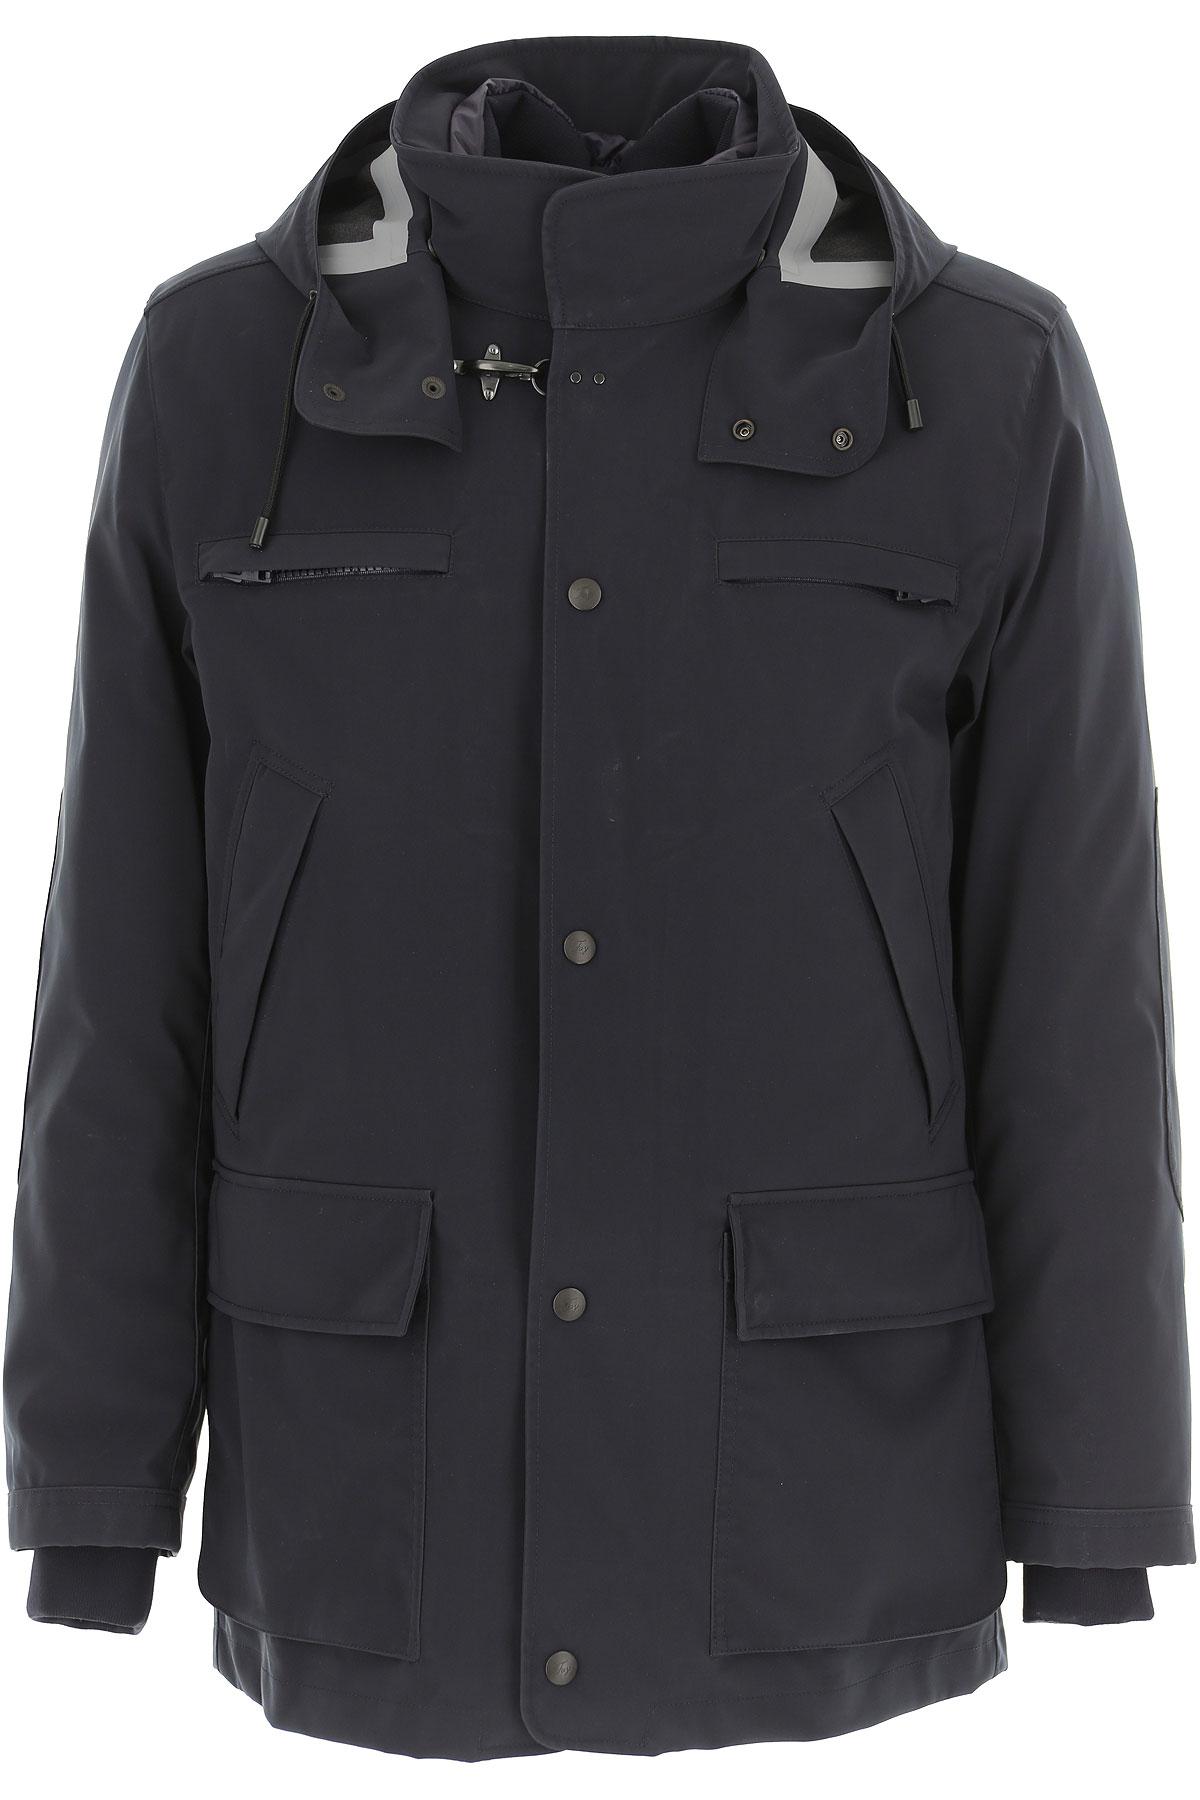 Fay Down Jacket for Men, Puffer Ski Jacket, Navy Blue, Down, 2019, L M S XL XXL